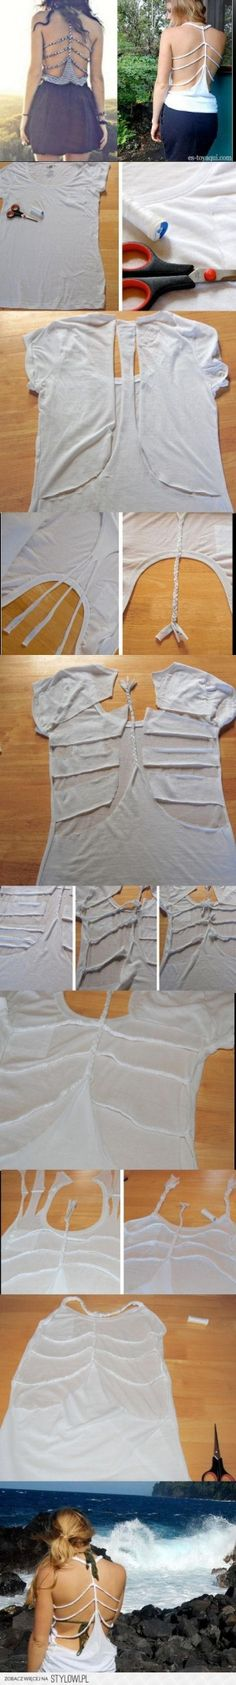 diy shirt by Rebecca Lee Briggs